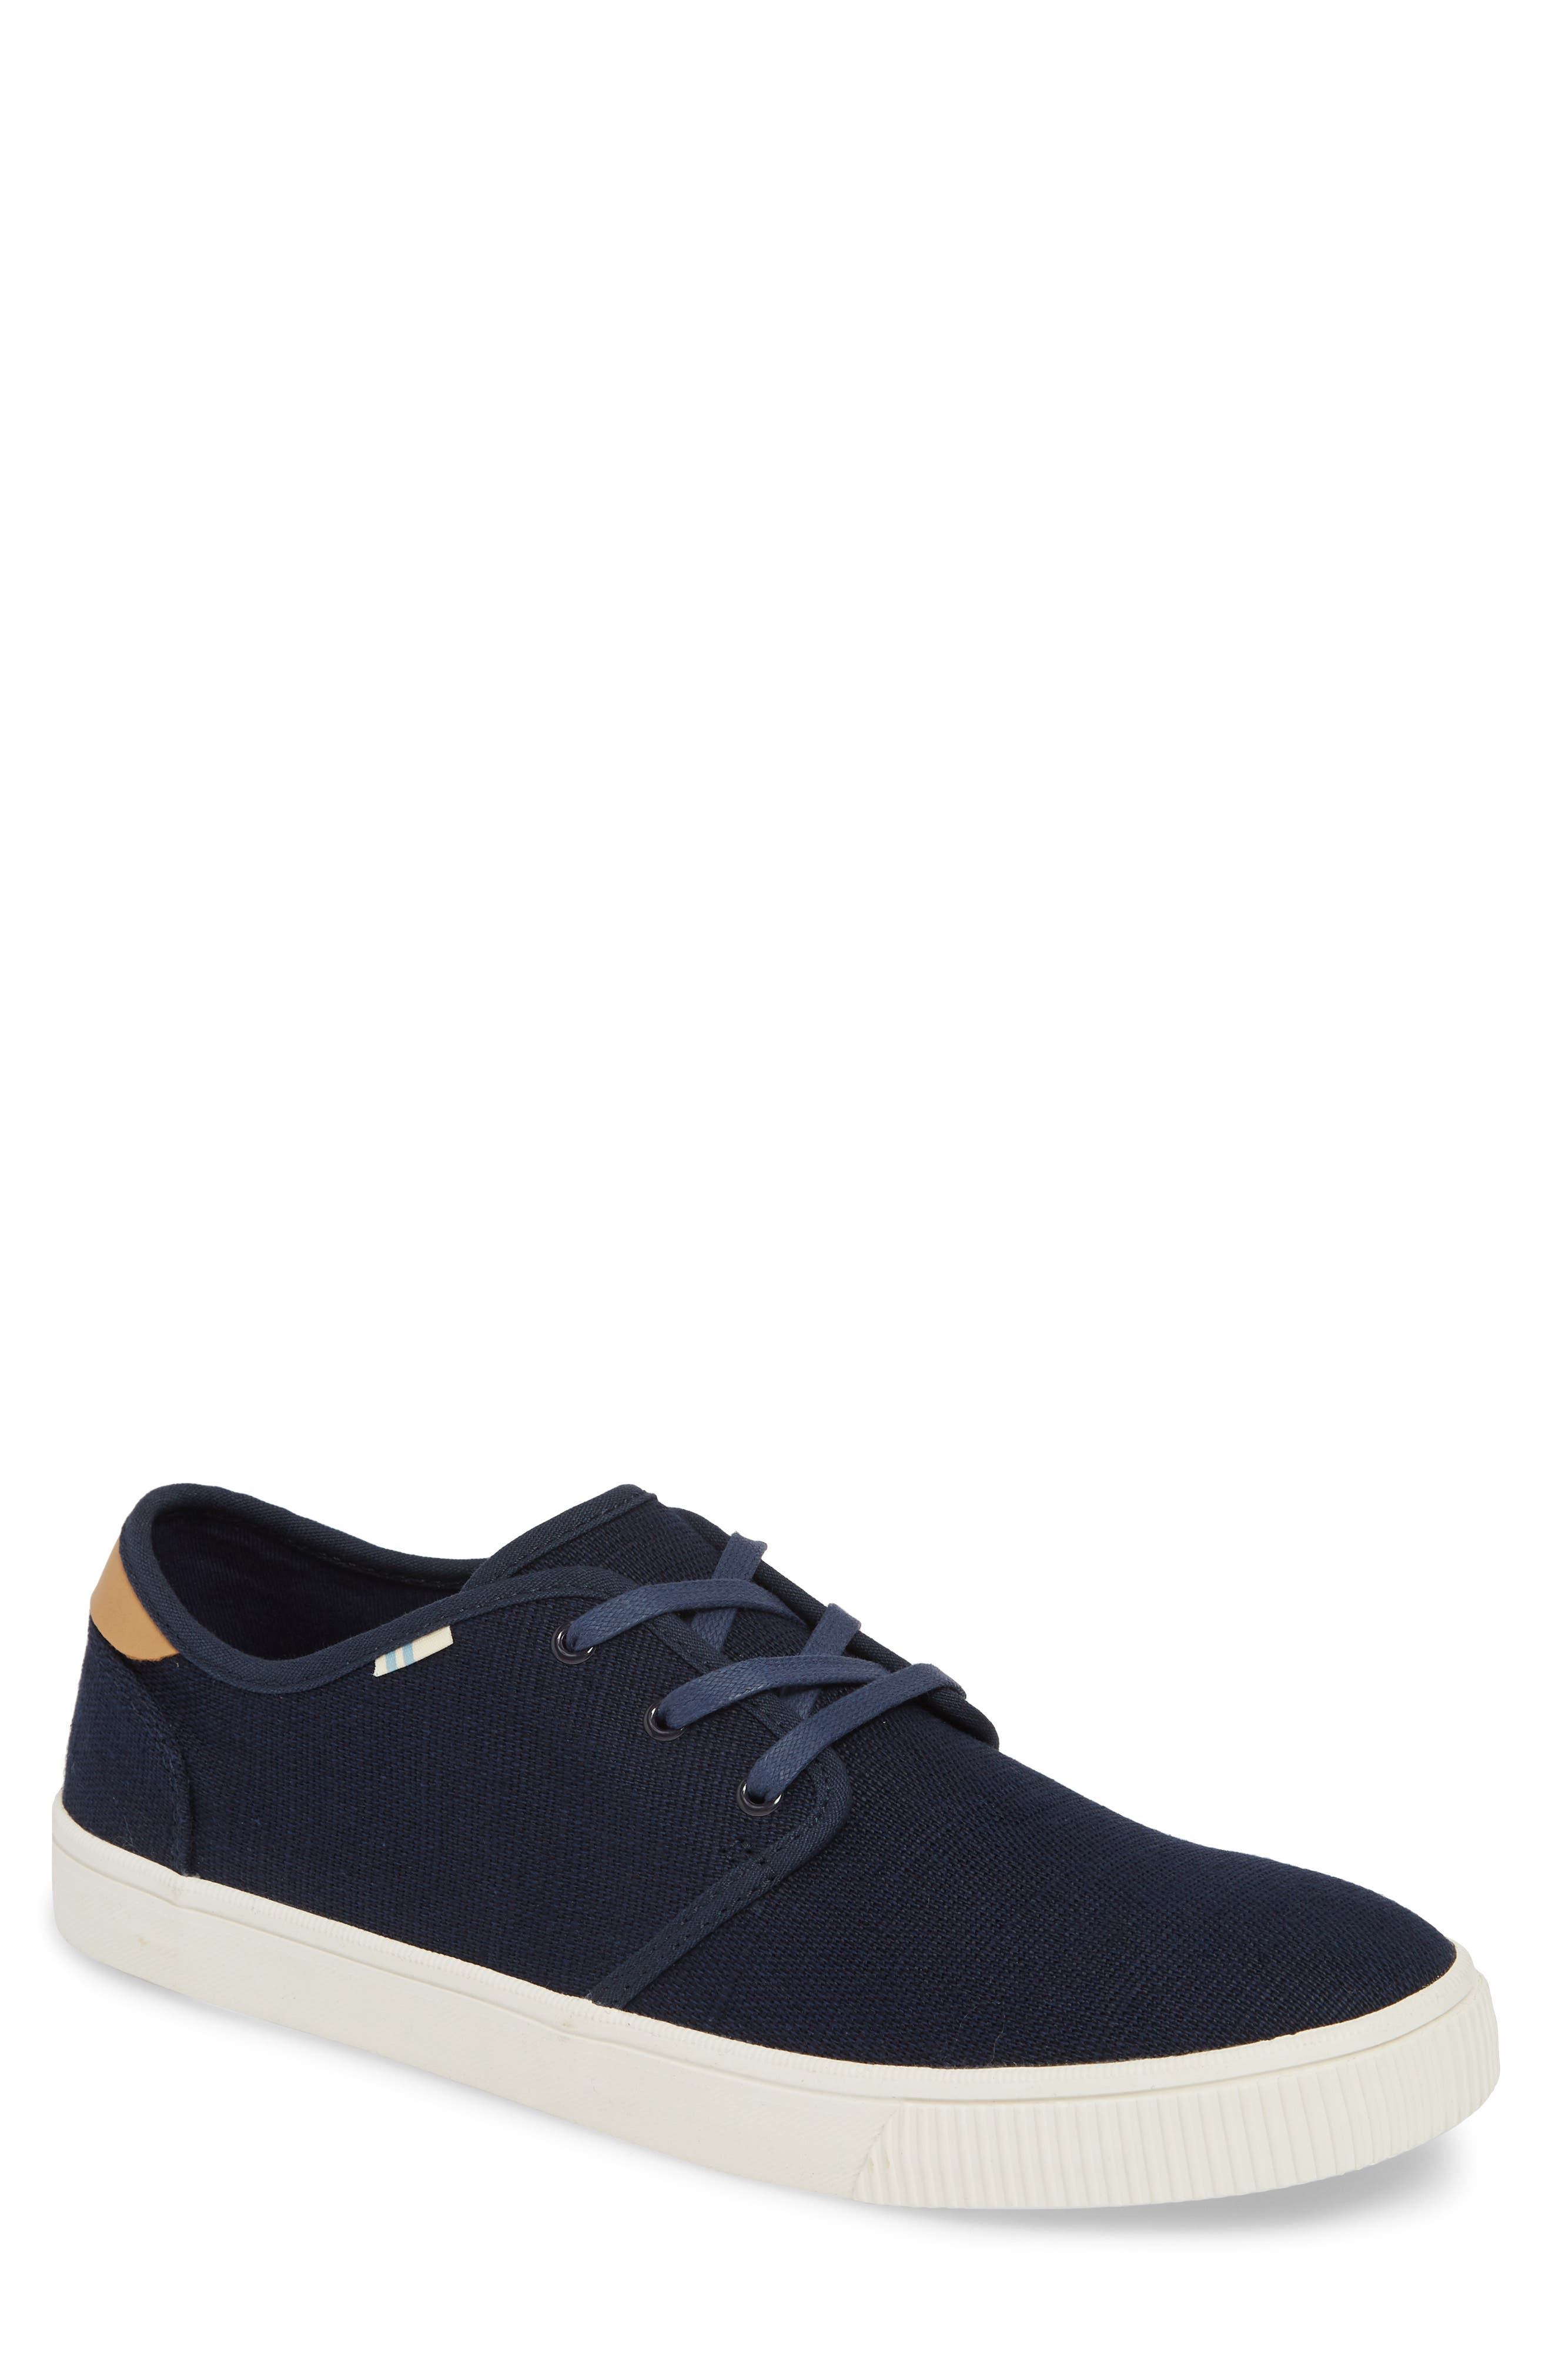 Toms Carlo Low Top Sneaker, Blue